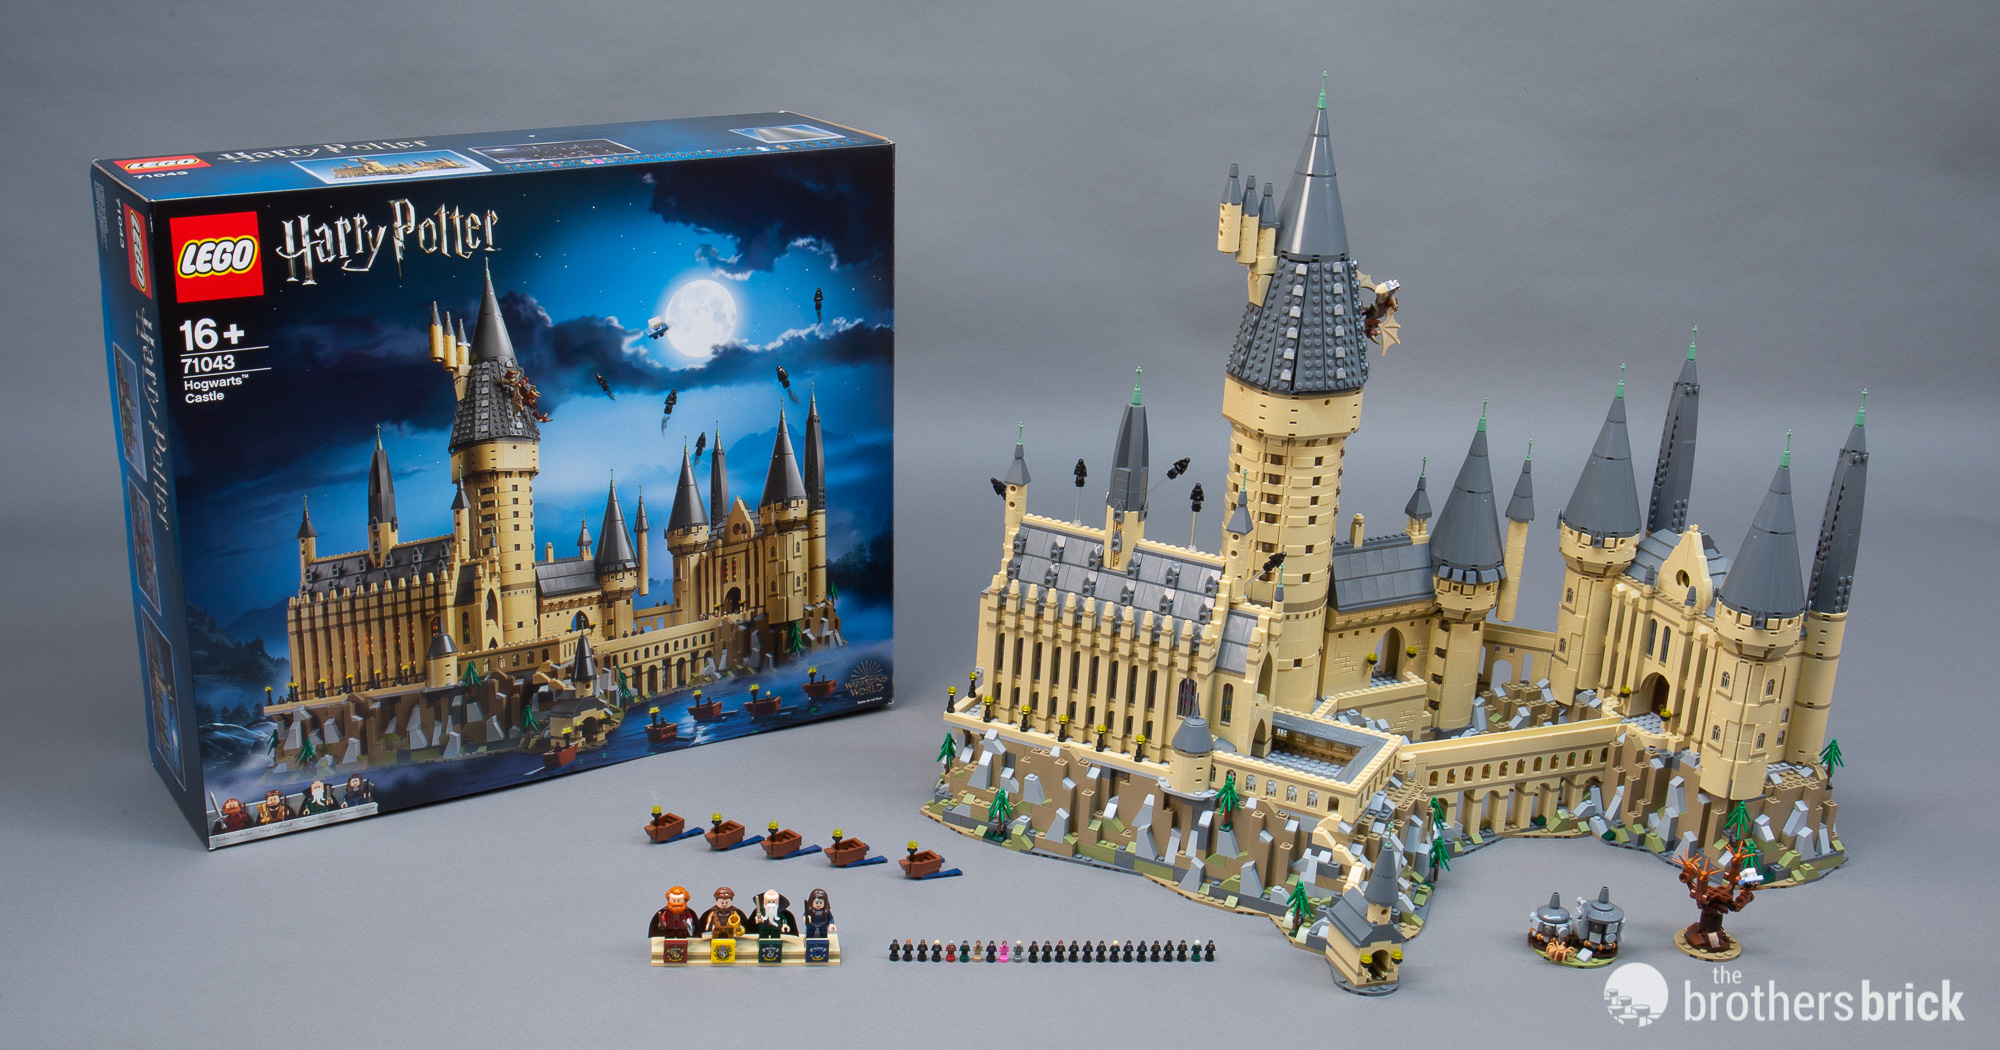 lego harry potter 71043 hogwarts castle 1 the brothers brick the brothers brick. Black Bedroom Furniture Sets. Home Design Ideas